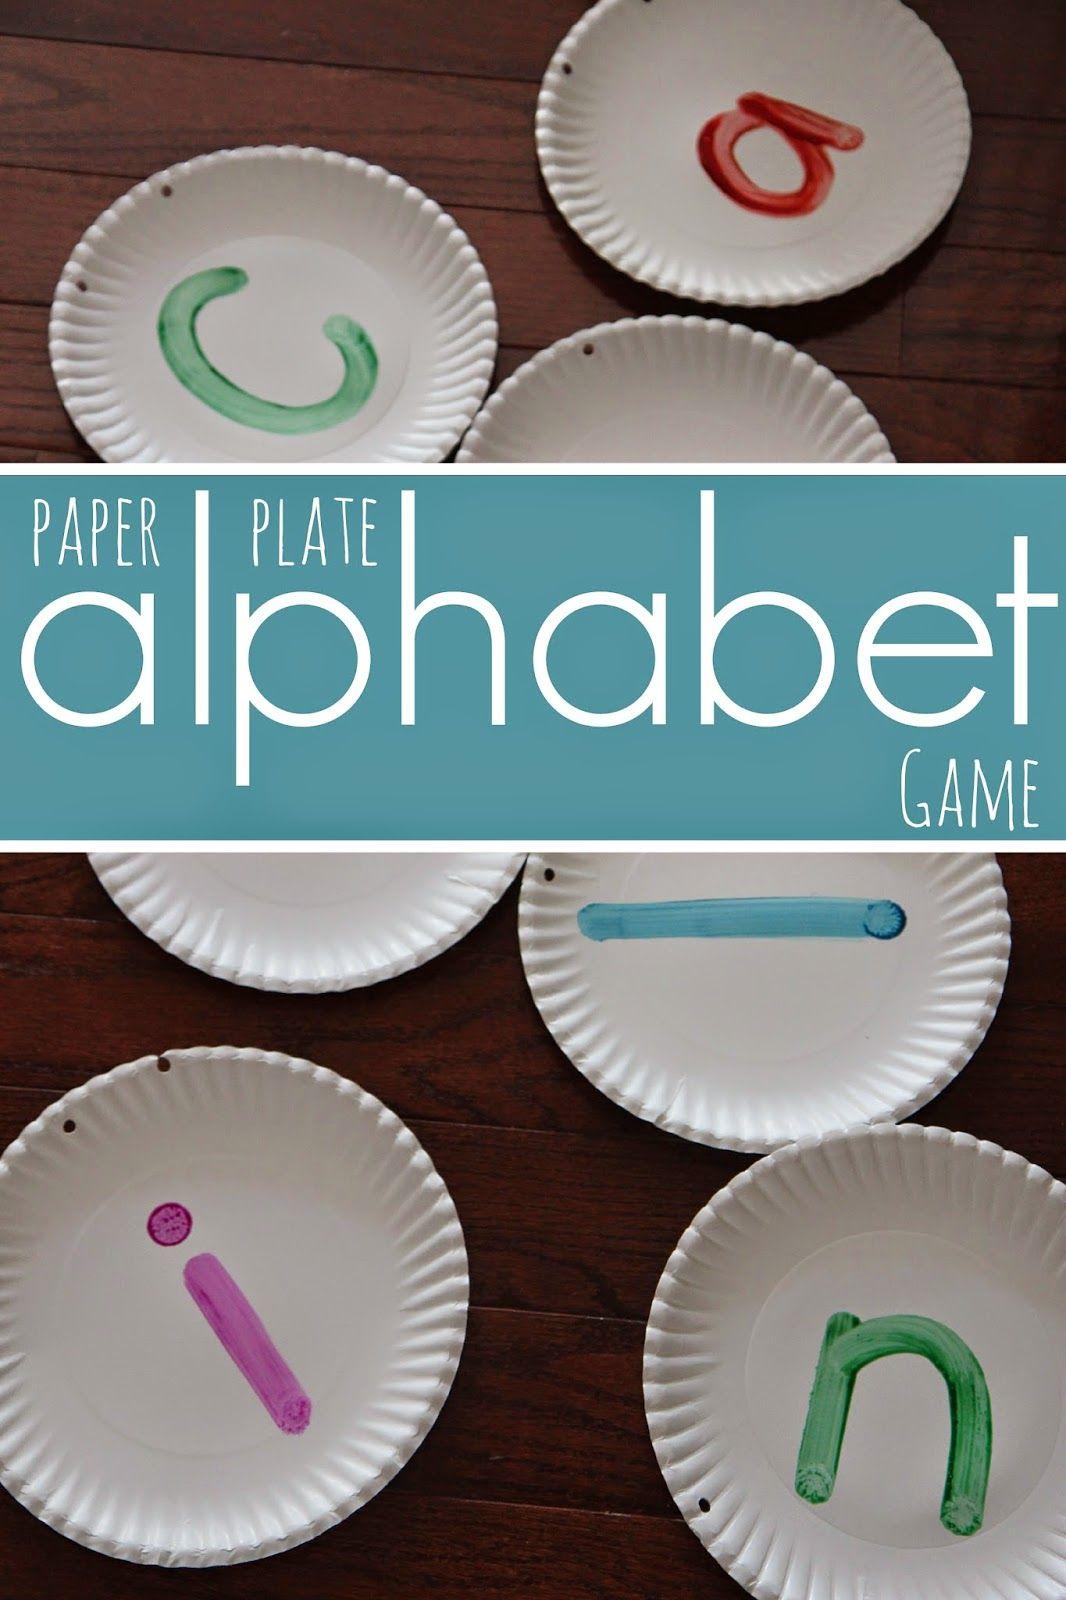 Worksheet Online Reading Program preschool paper plate alphabet game back to school basics this post is sponsored by reading eggs an online program for kids as